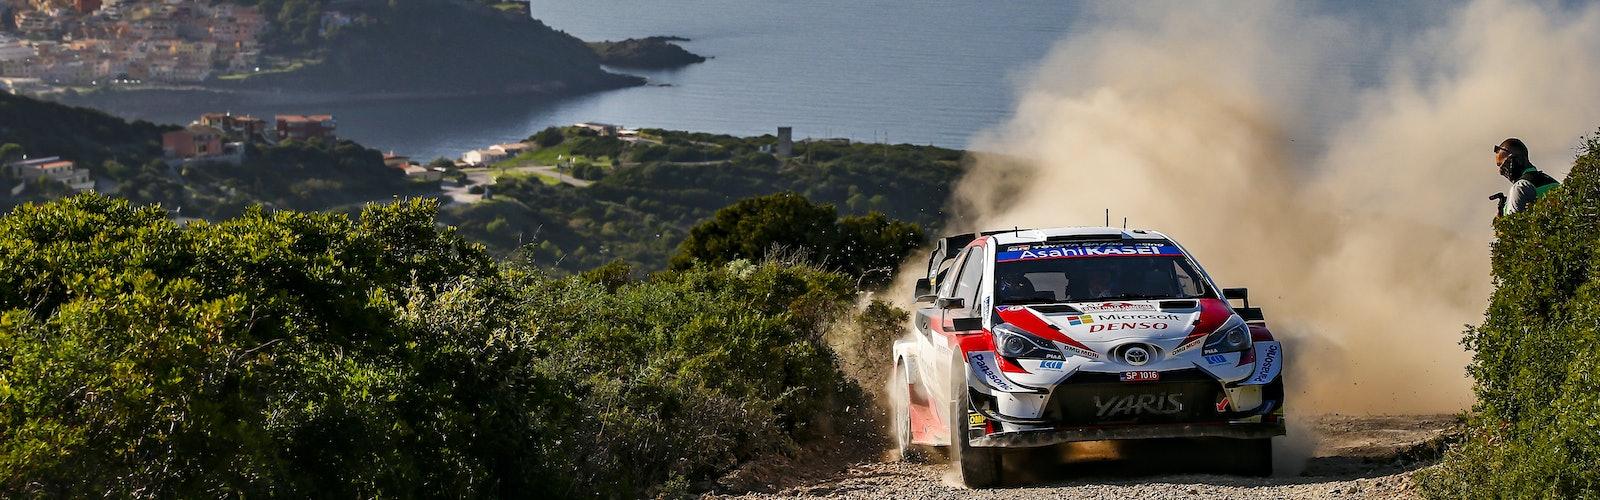 WRC_2020_Rd.6_100